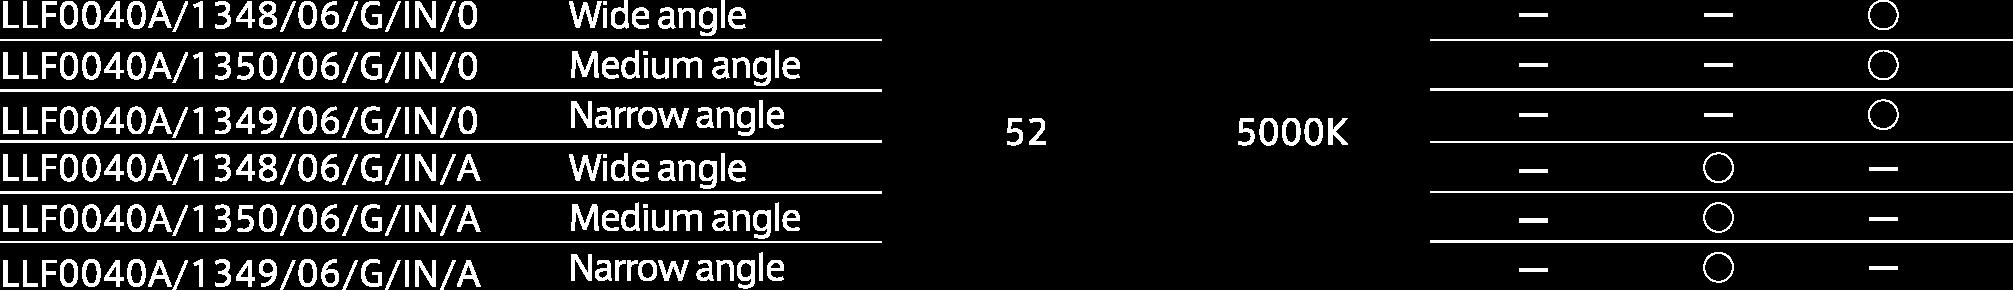 LLF0040A spec list